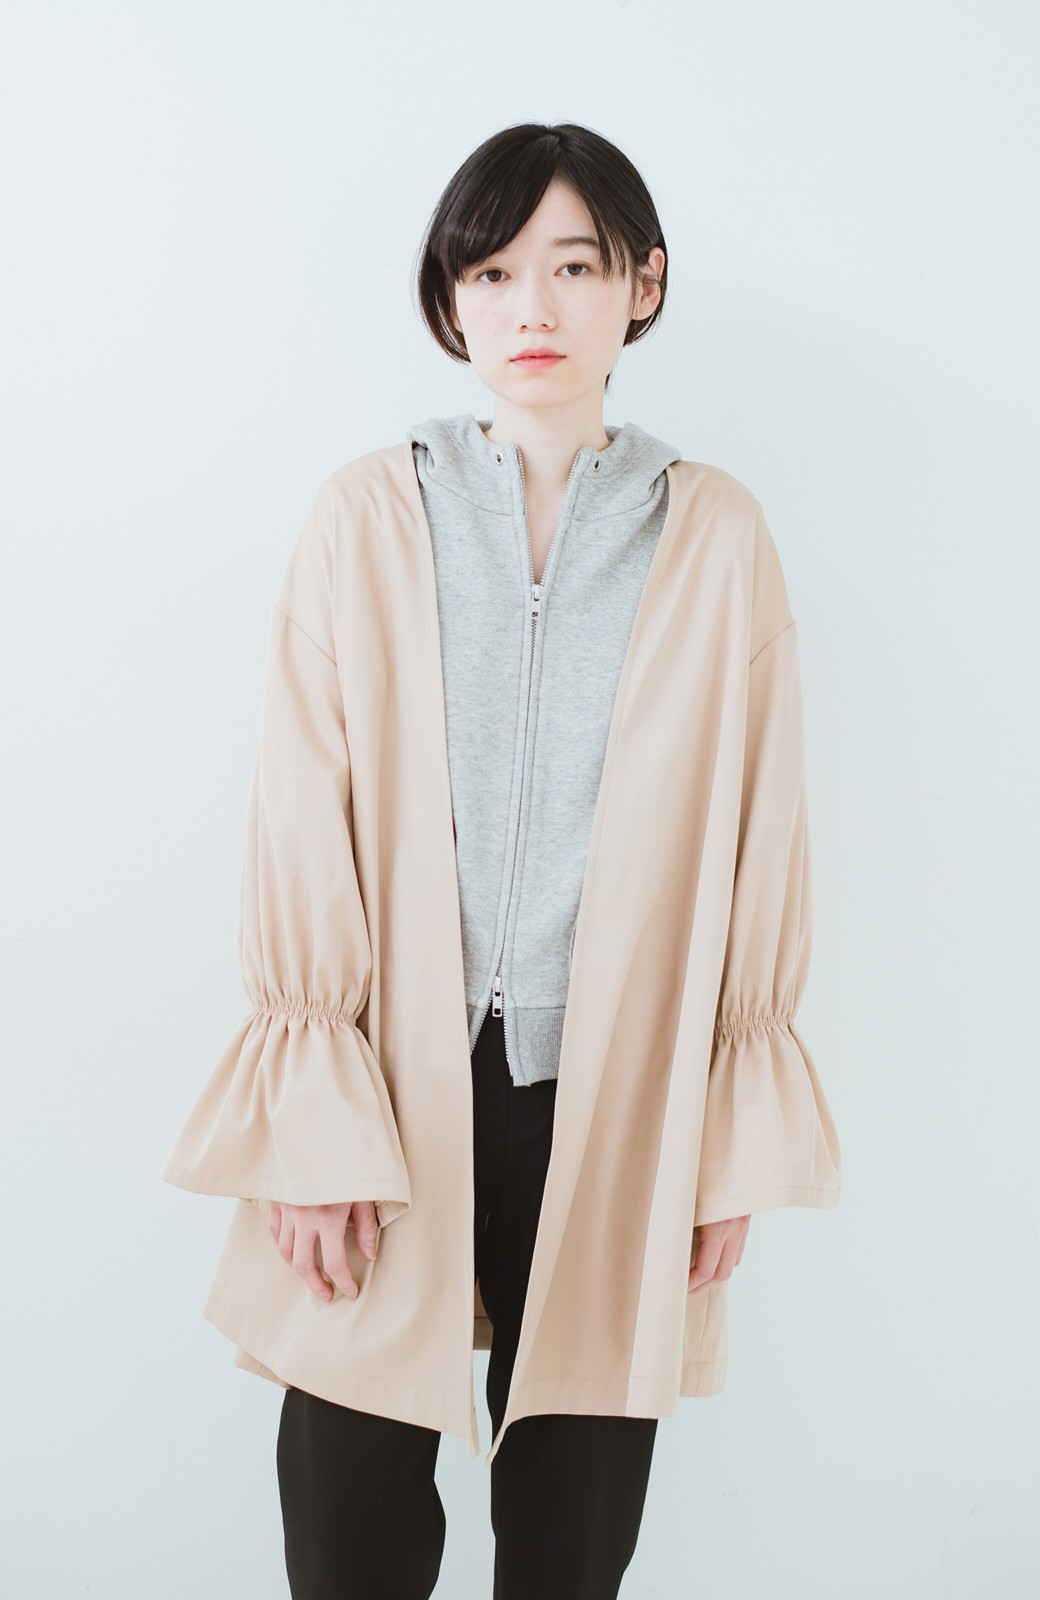 haco! ただ羽織るだけでオシャレに見える 気軽なフレアースリーブコート <ベージュ>の商品写真17